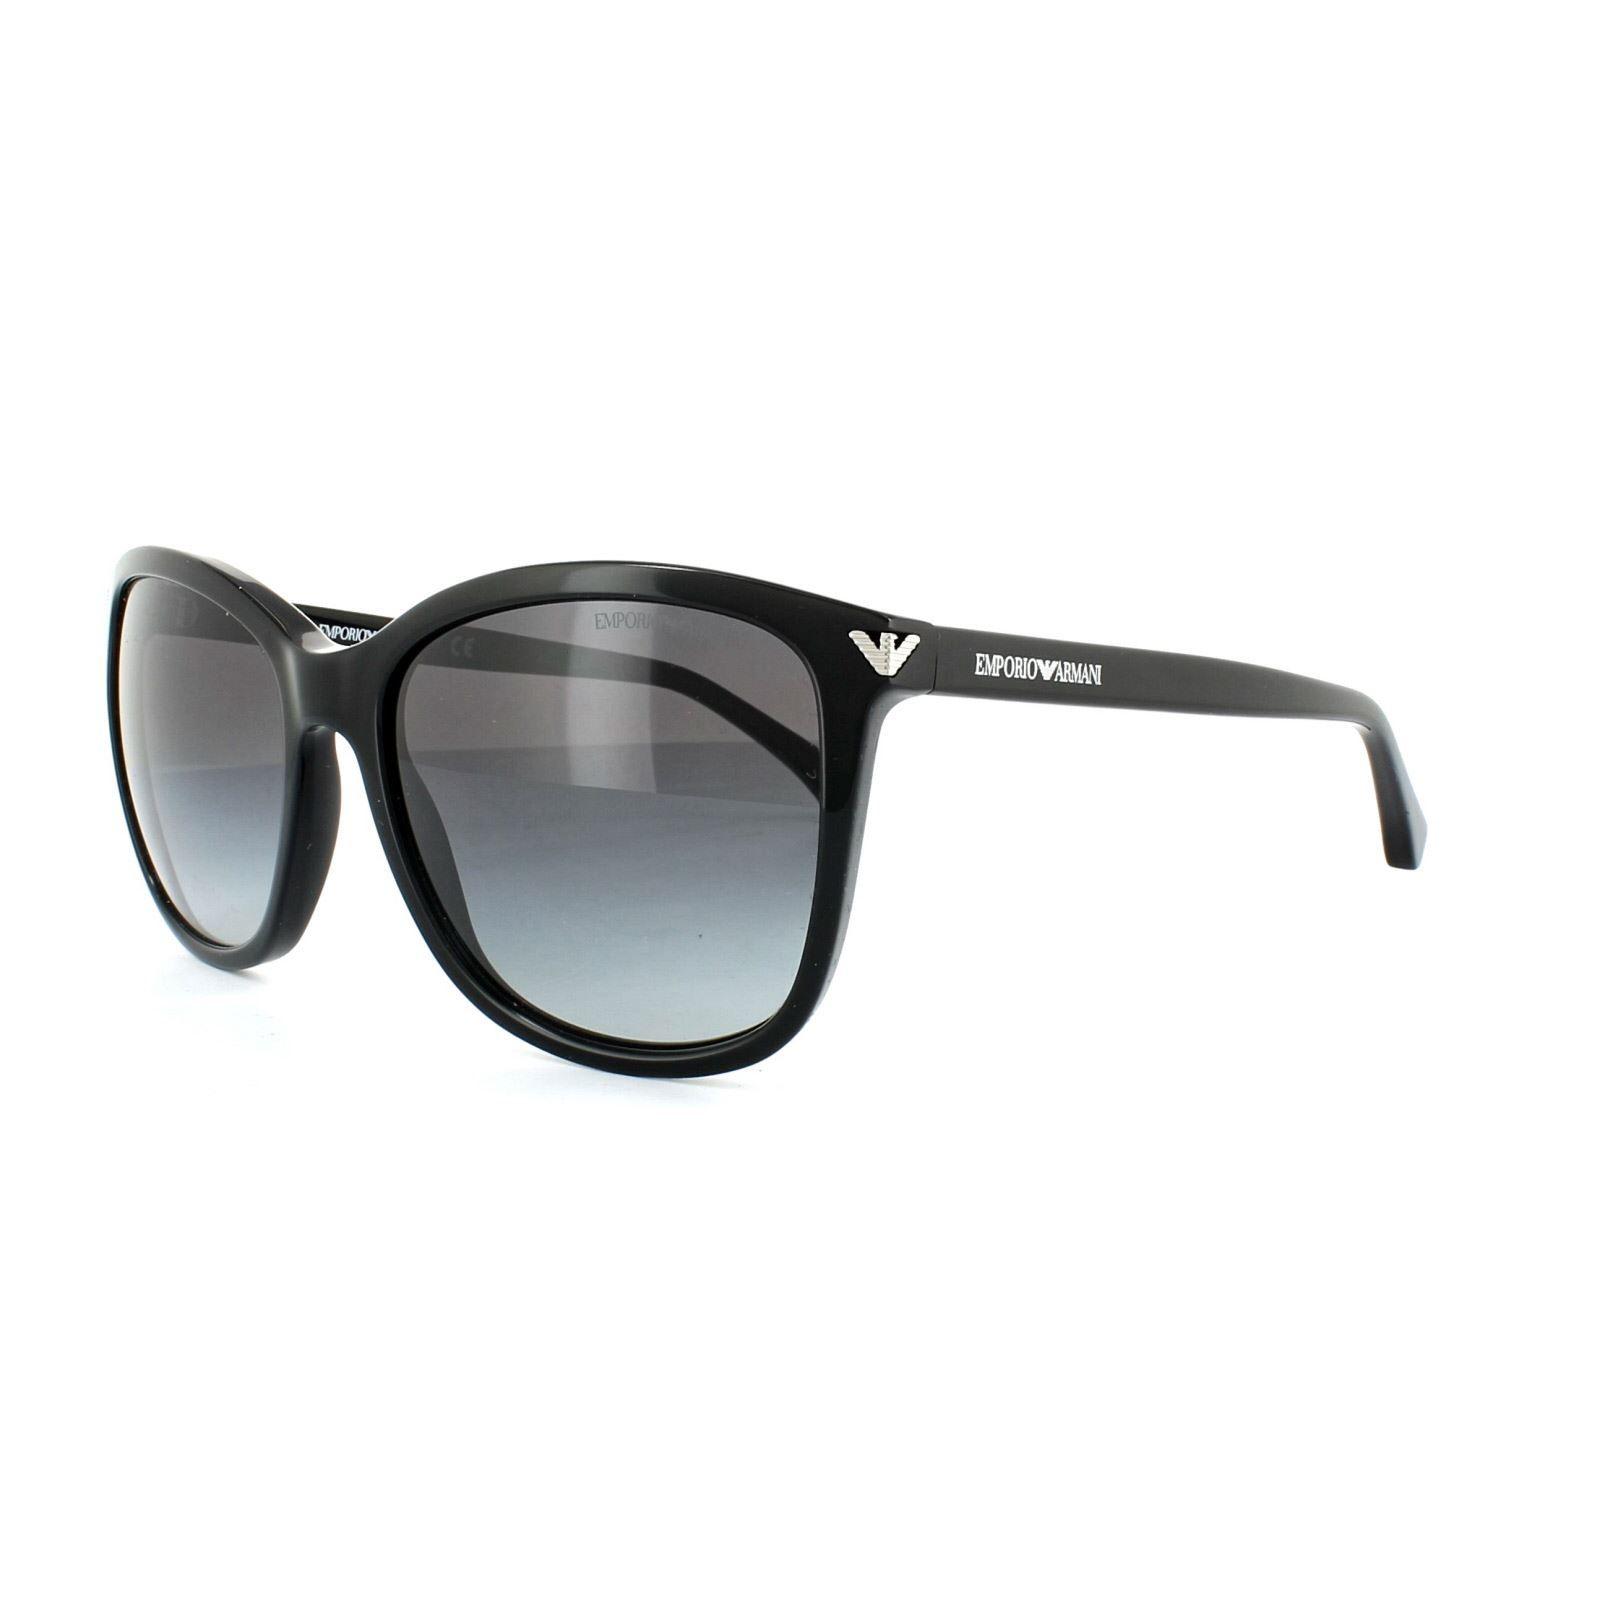 Emporio Armani Sunglasses 4060 5017/8G Black Grey Gradient